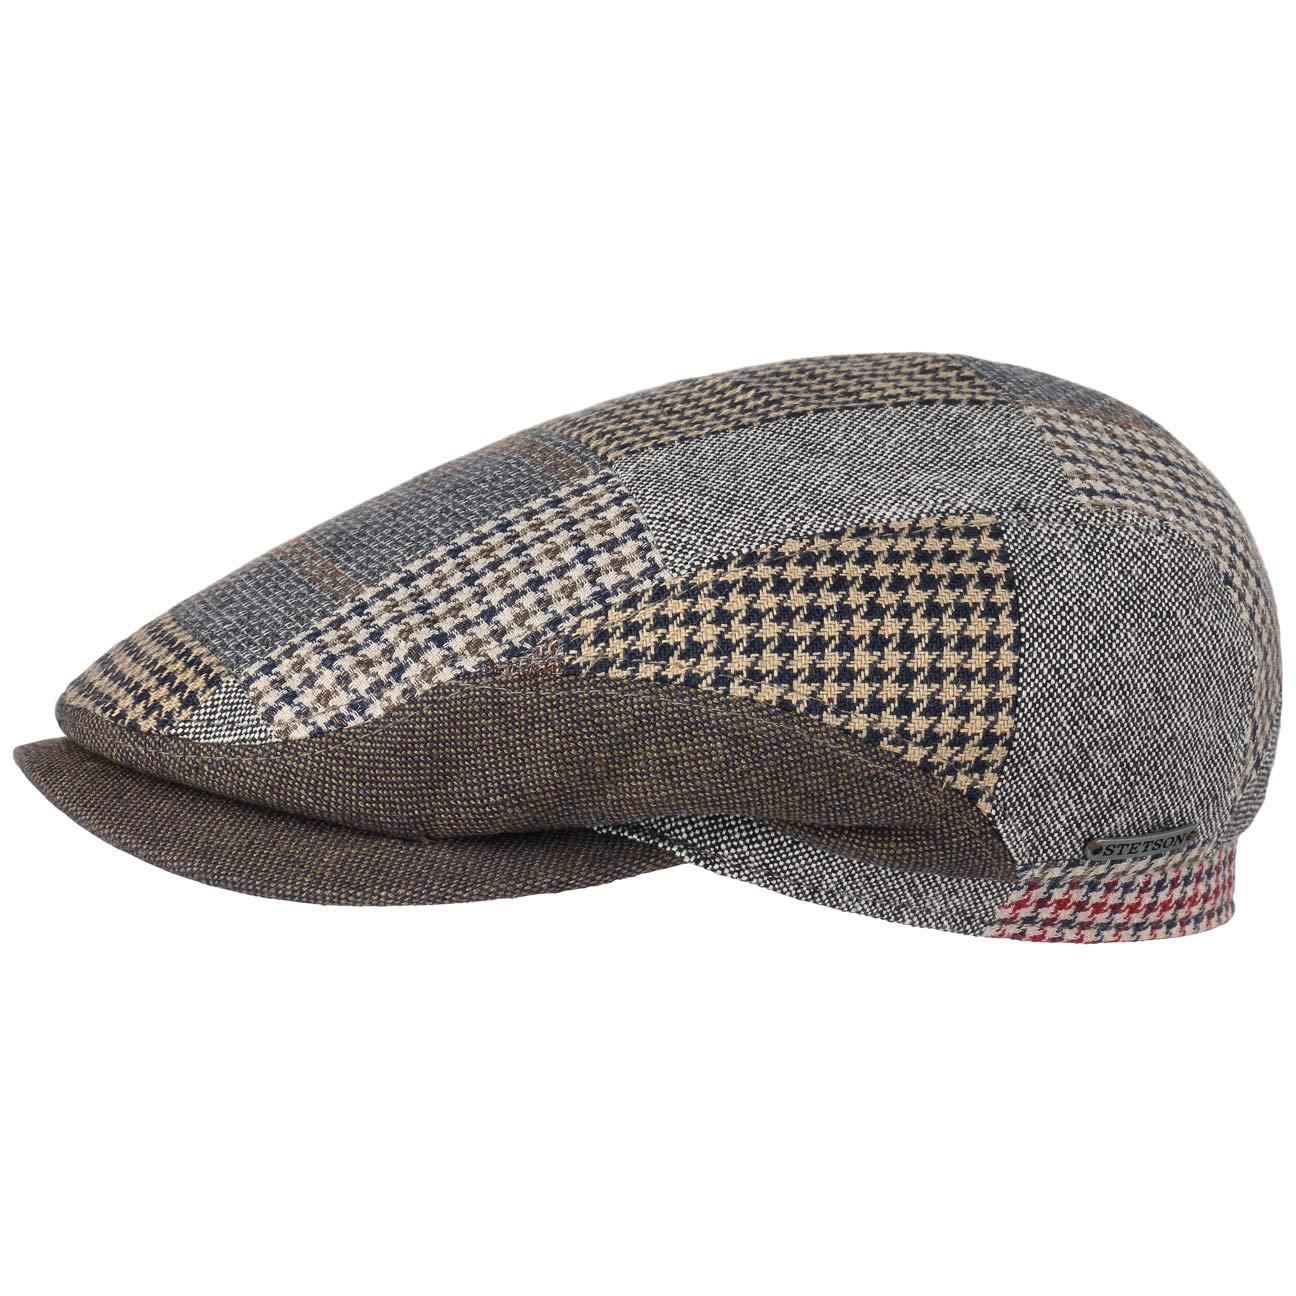 721a117d9af Stetson Tecopa Patchwork Flat Cap Ivy hat (62 cm - Brown-Beige)   Amazon.co.uk  Clothing